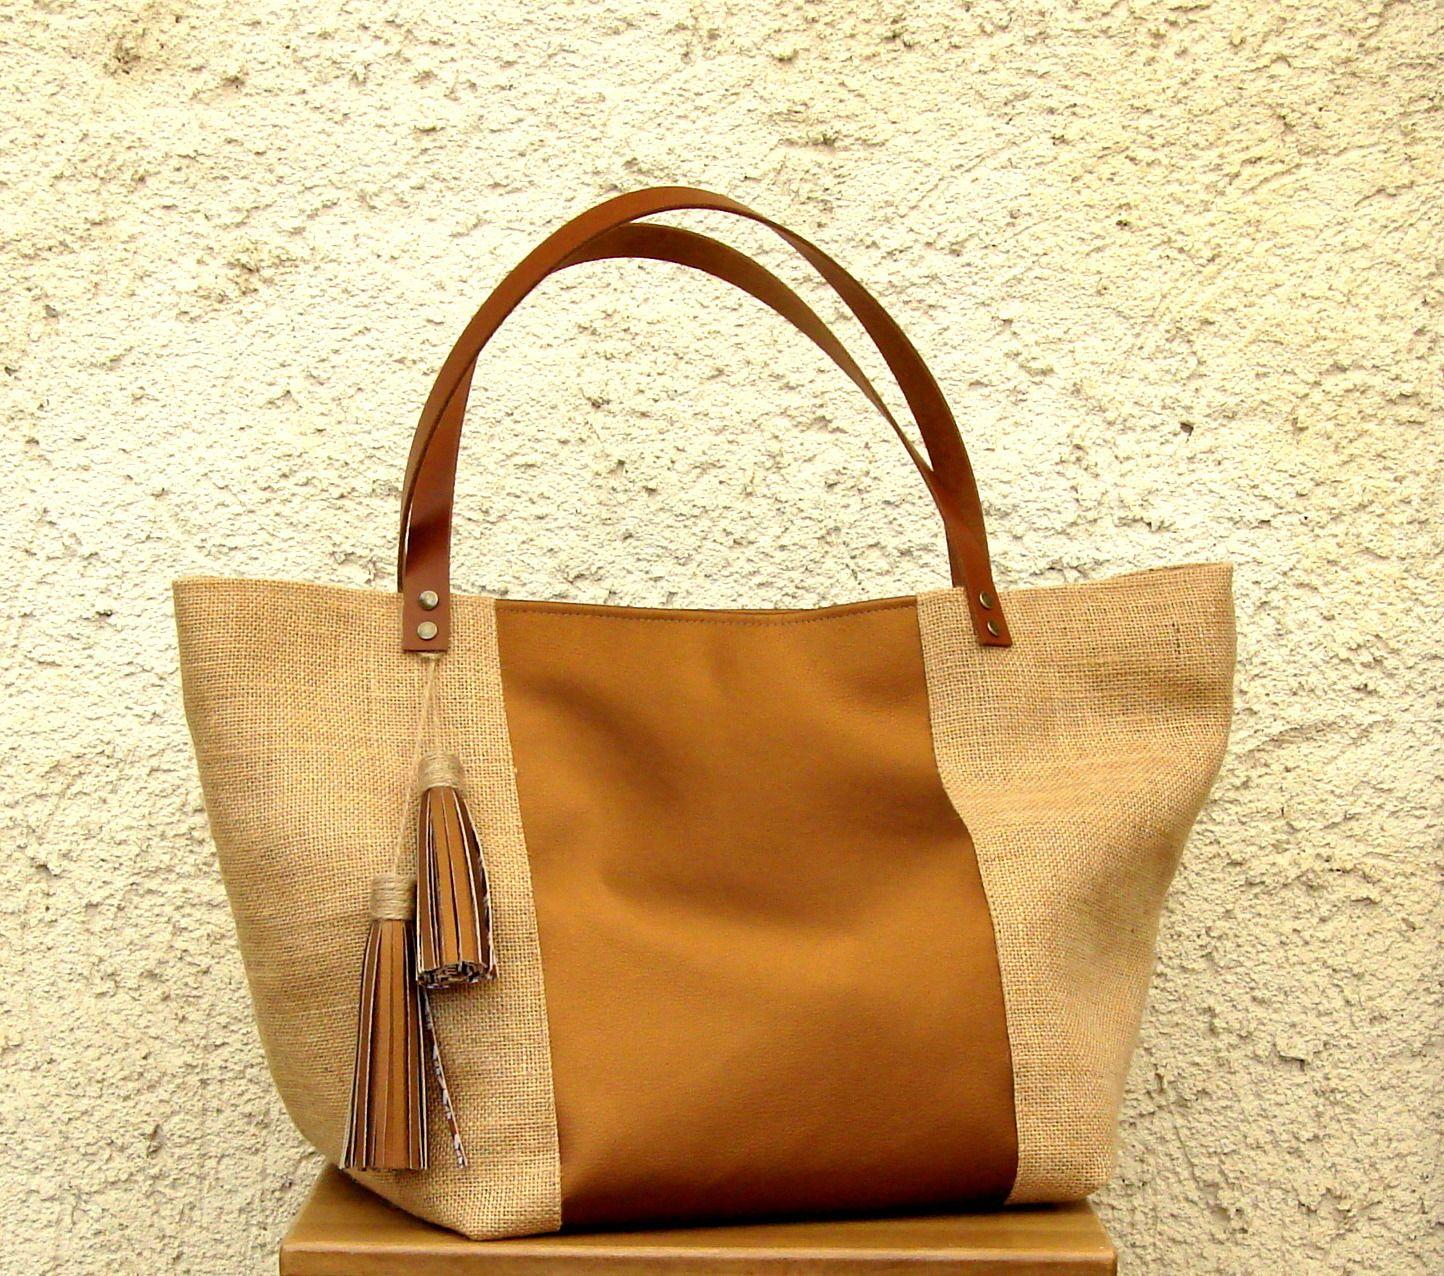 grand sac cabas ou shopping en toile de jute lounah couture pinterest. Black Bedroom Furniture Sets. Home Design Ideas